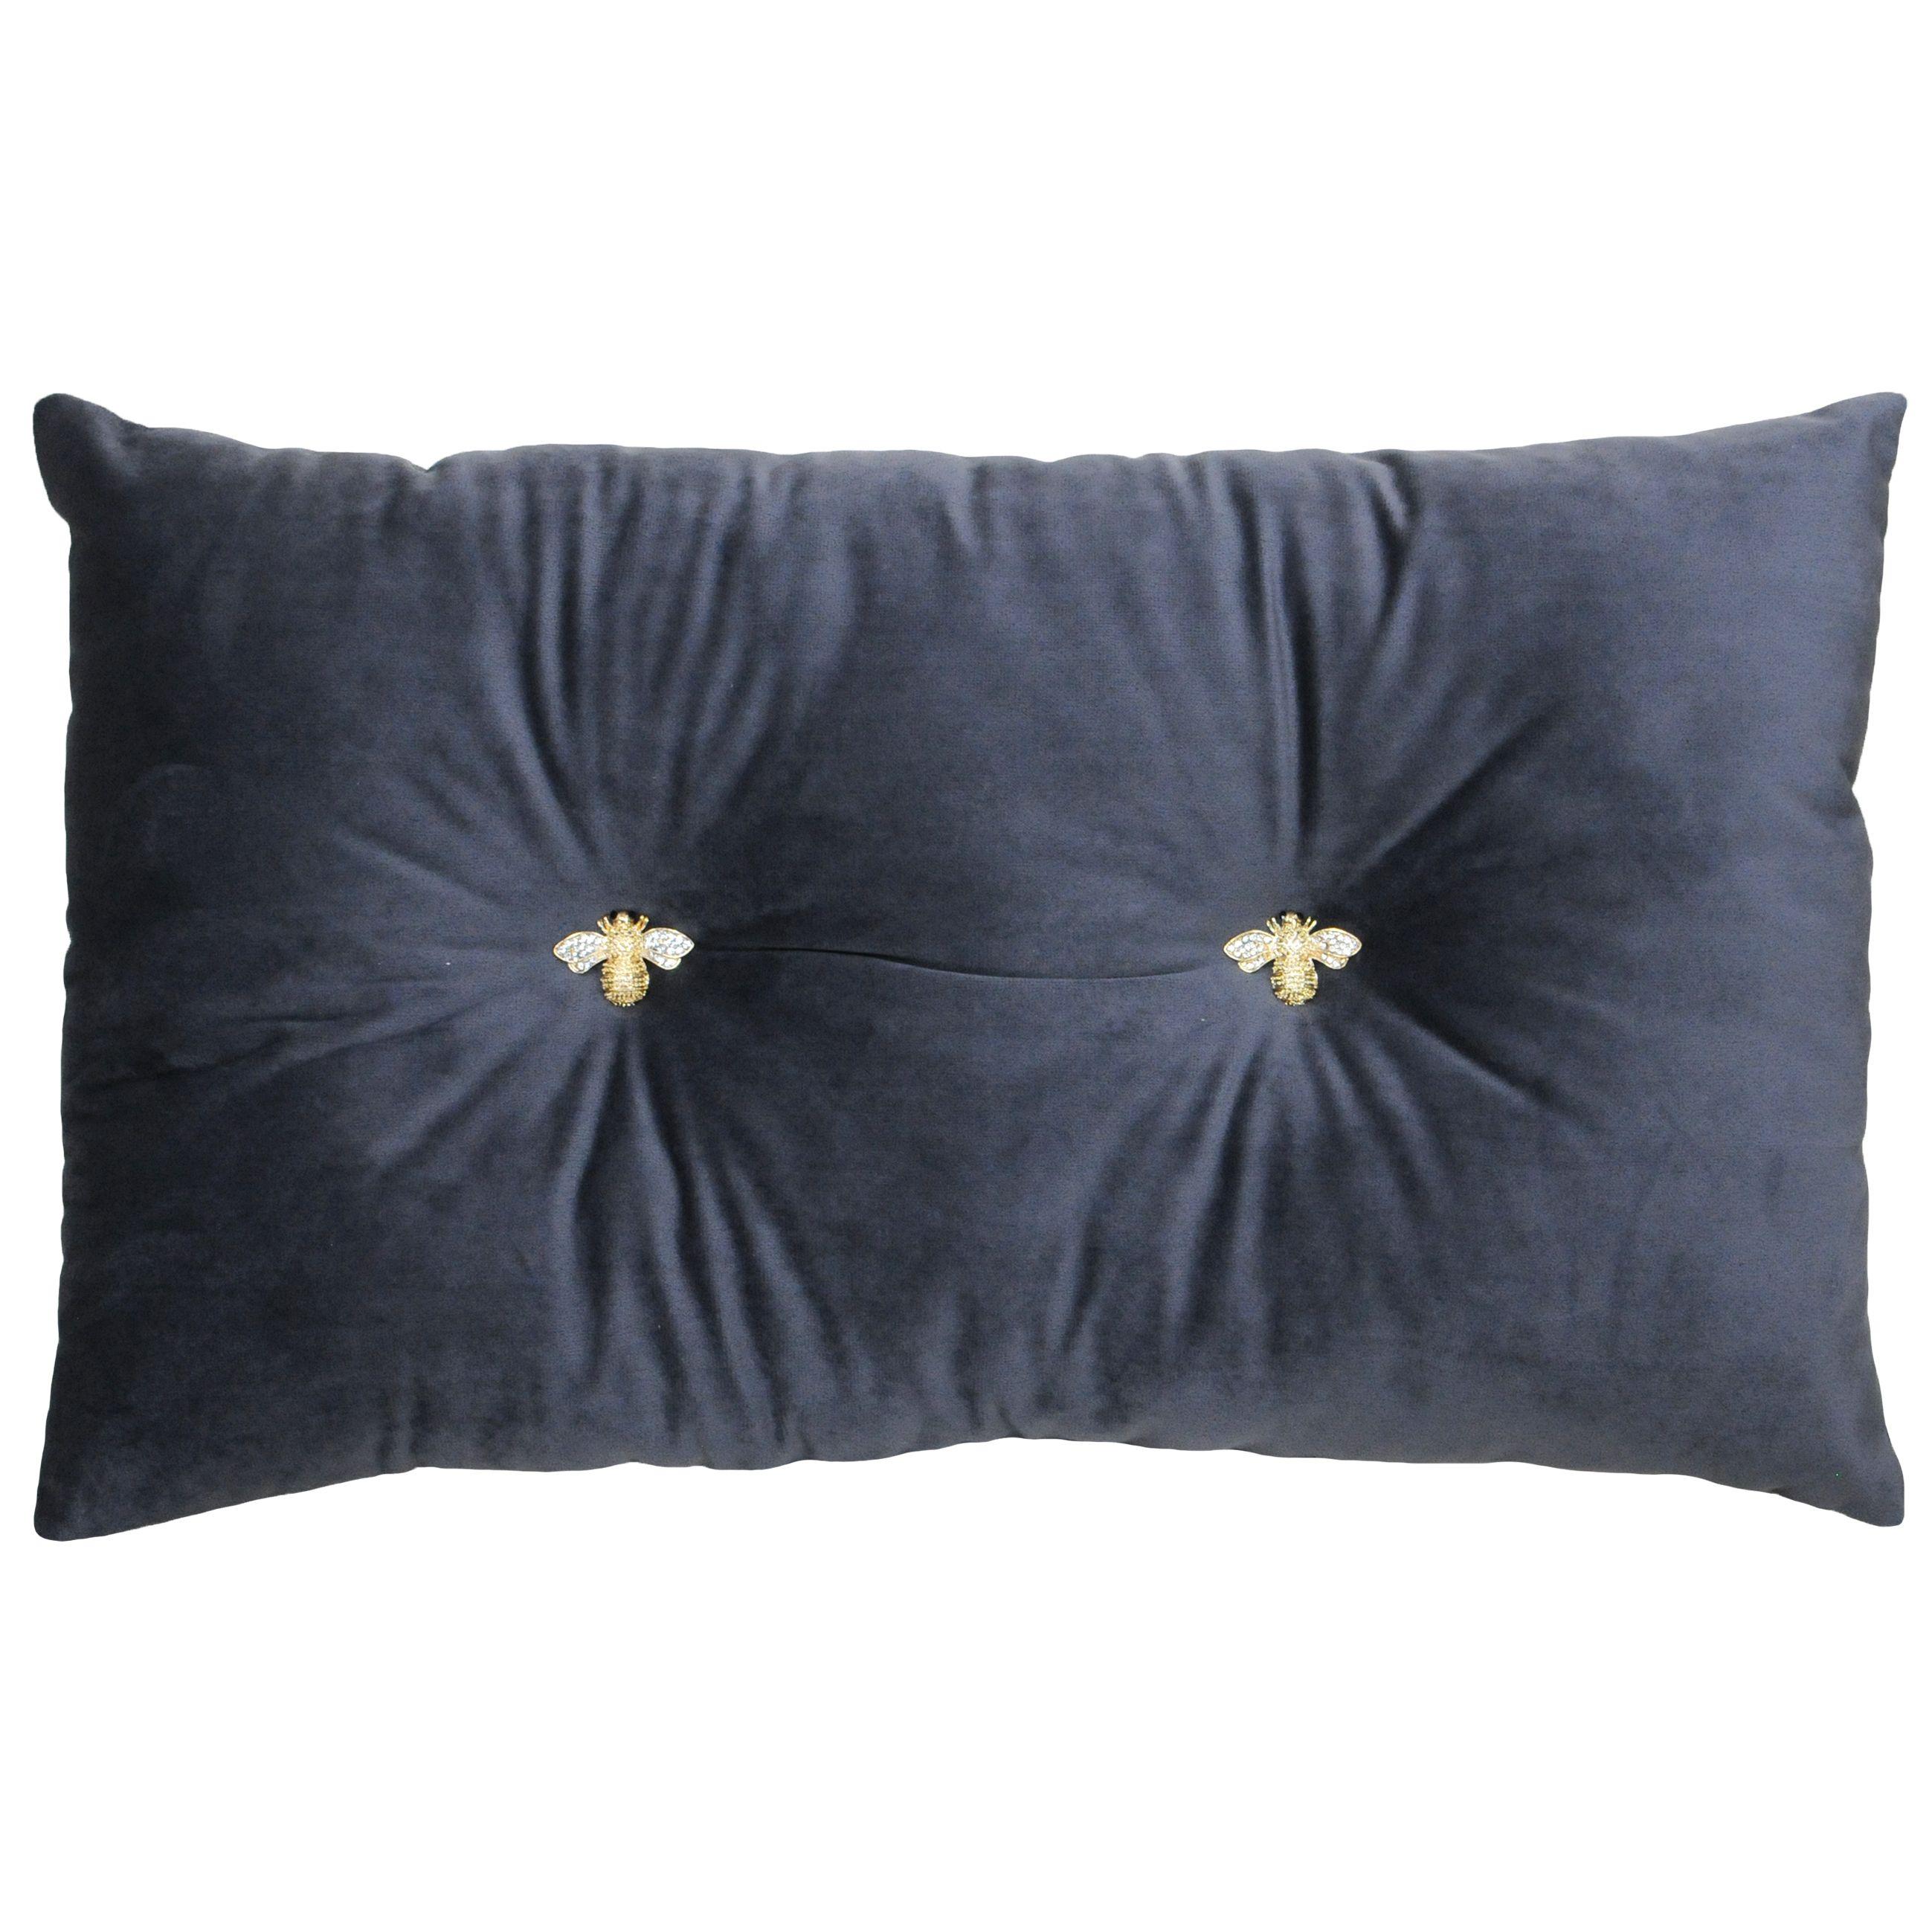 Bumble 30X50 Pf/Cushion Charcoal